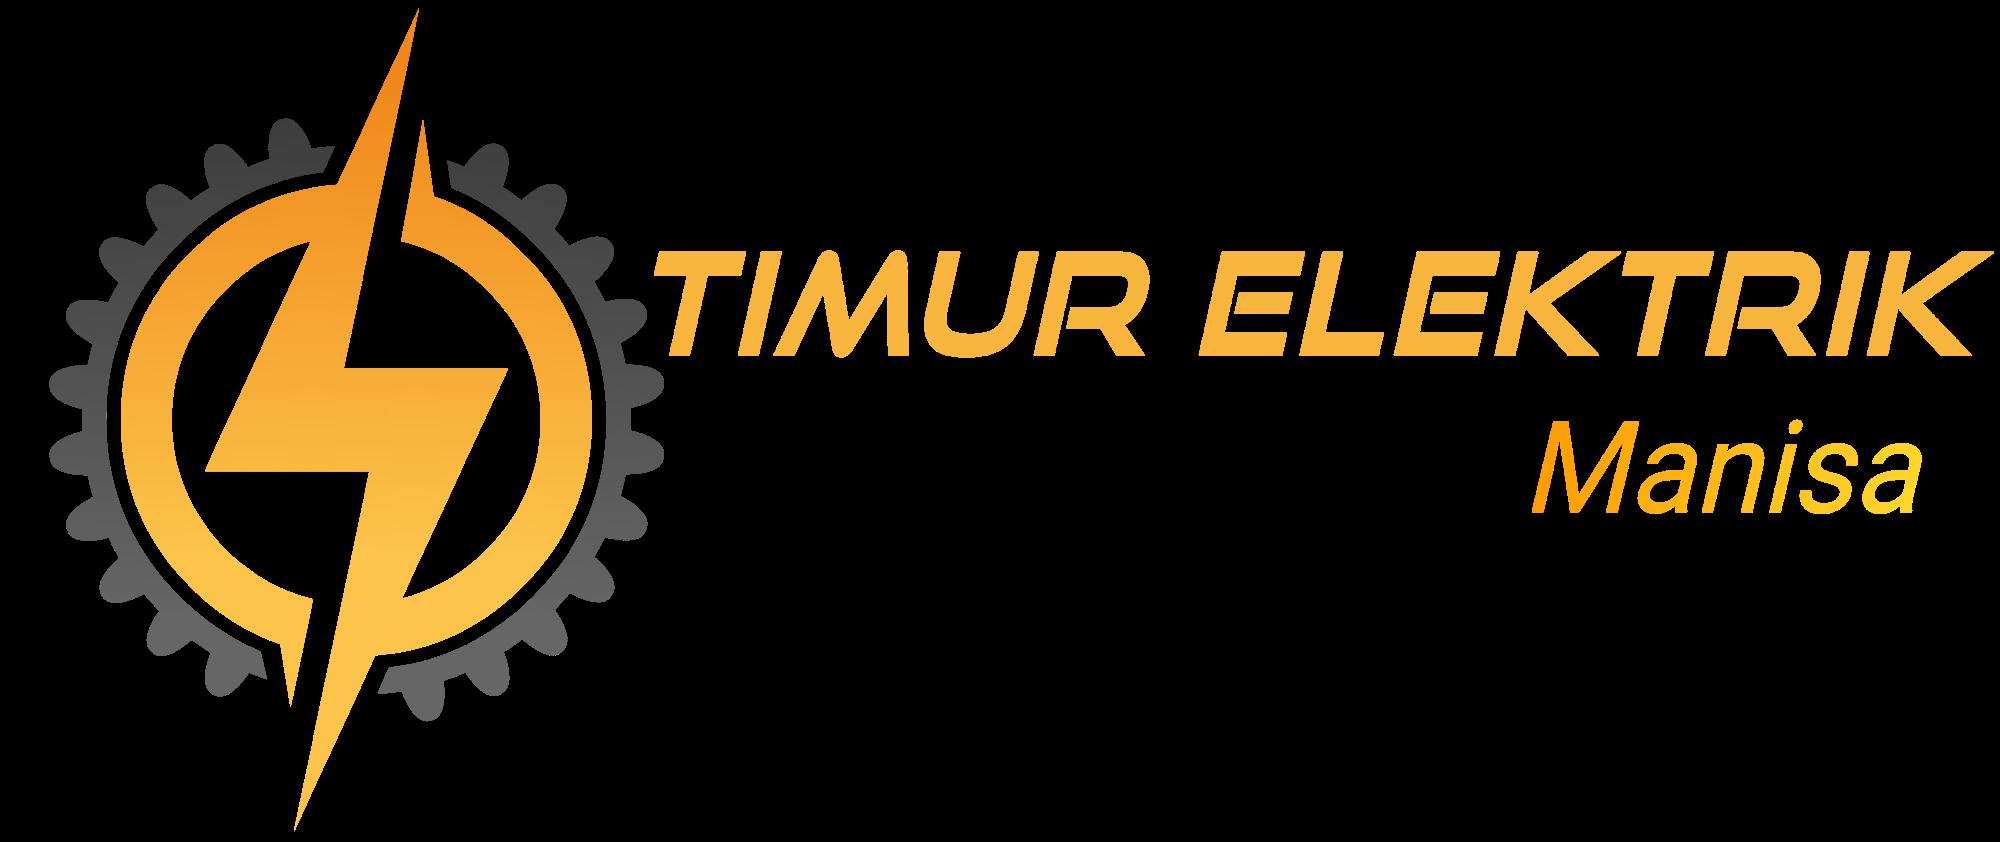 Manisa Elektrikçi – 0507 199 57 26 – Timur Elektrik